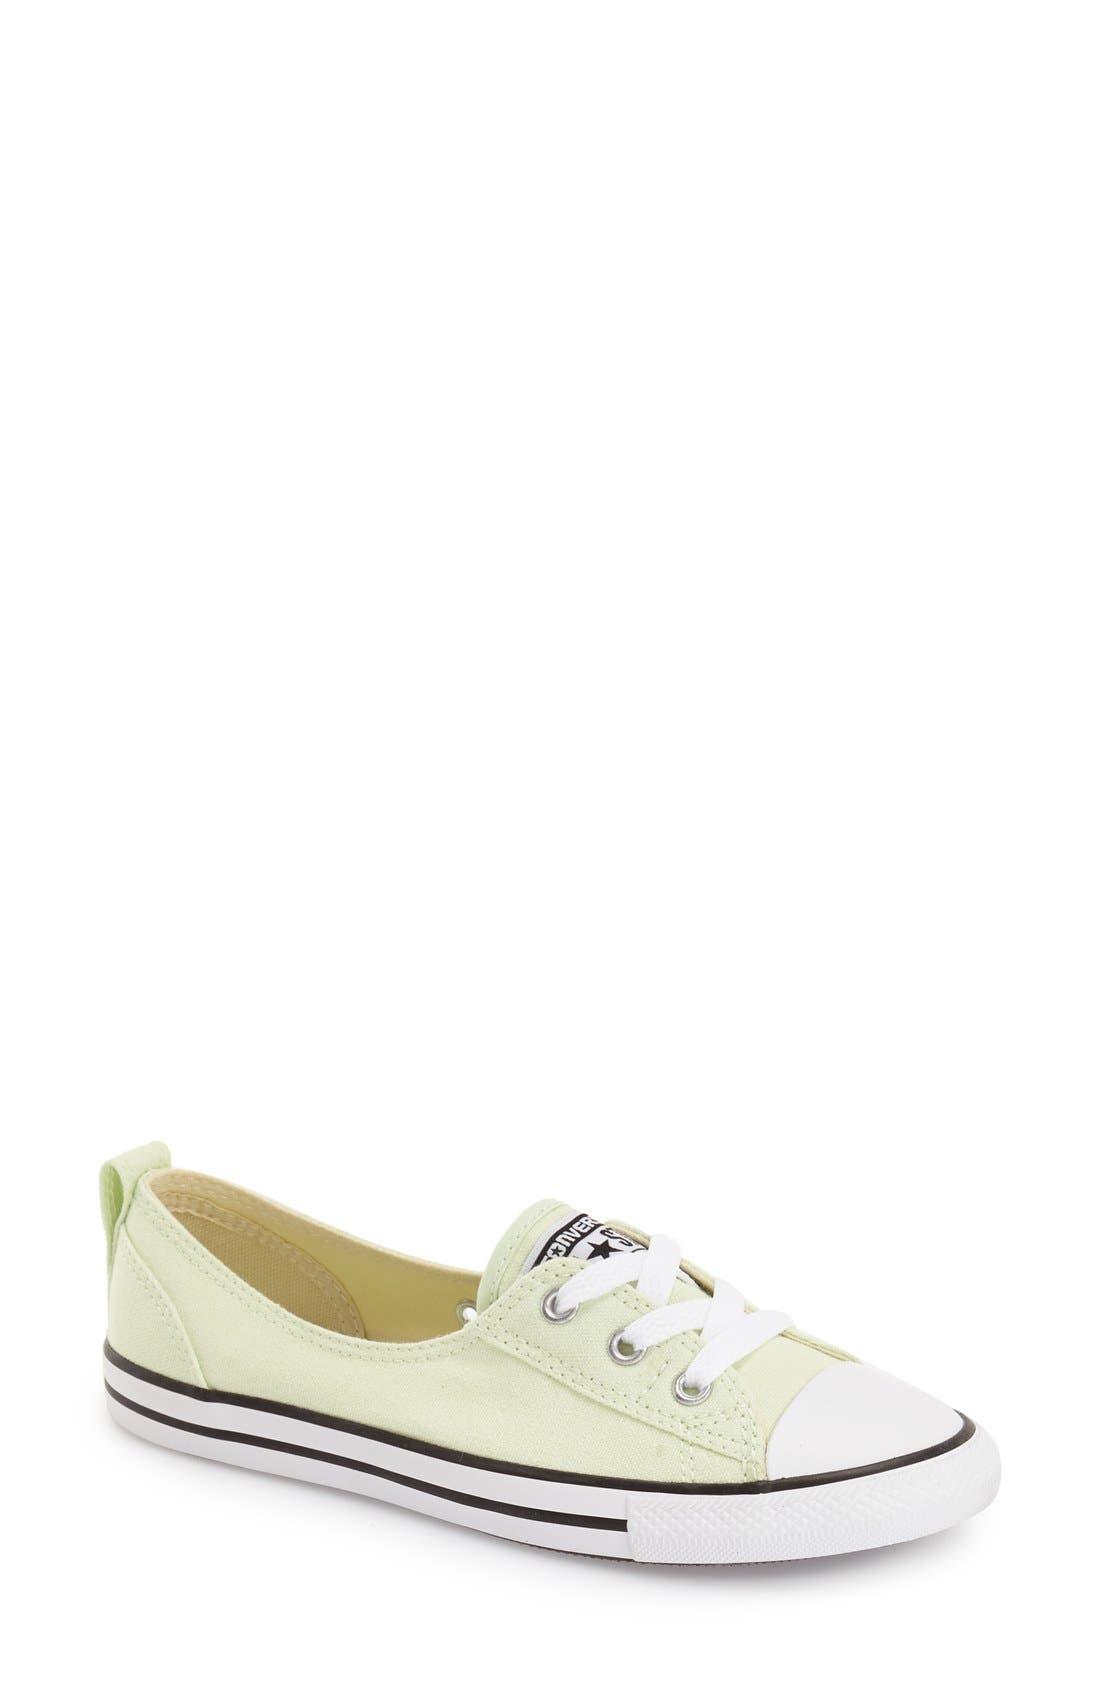 Alternate Image 1 Selected - Converse Chuck Taylor® All Star® Ballet Sneaker (Women)